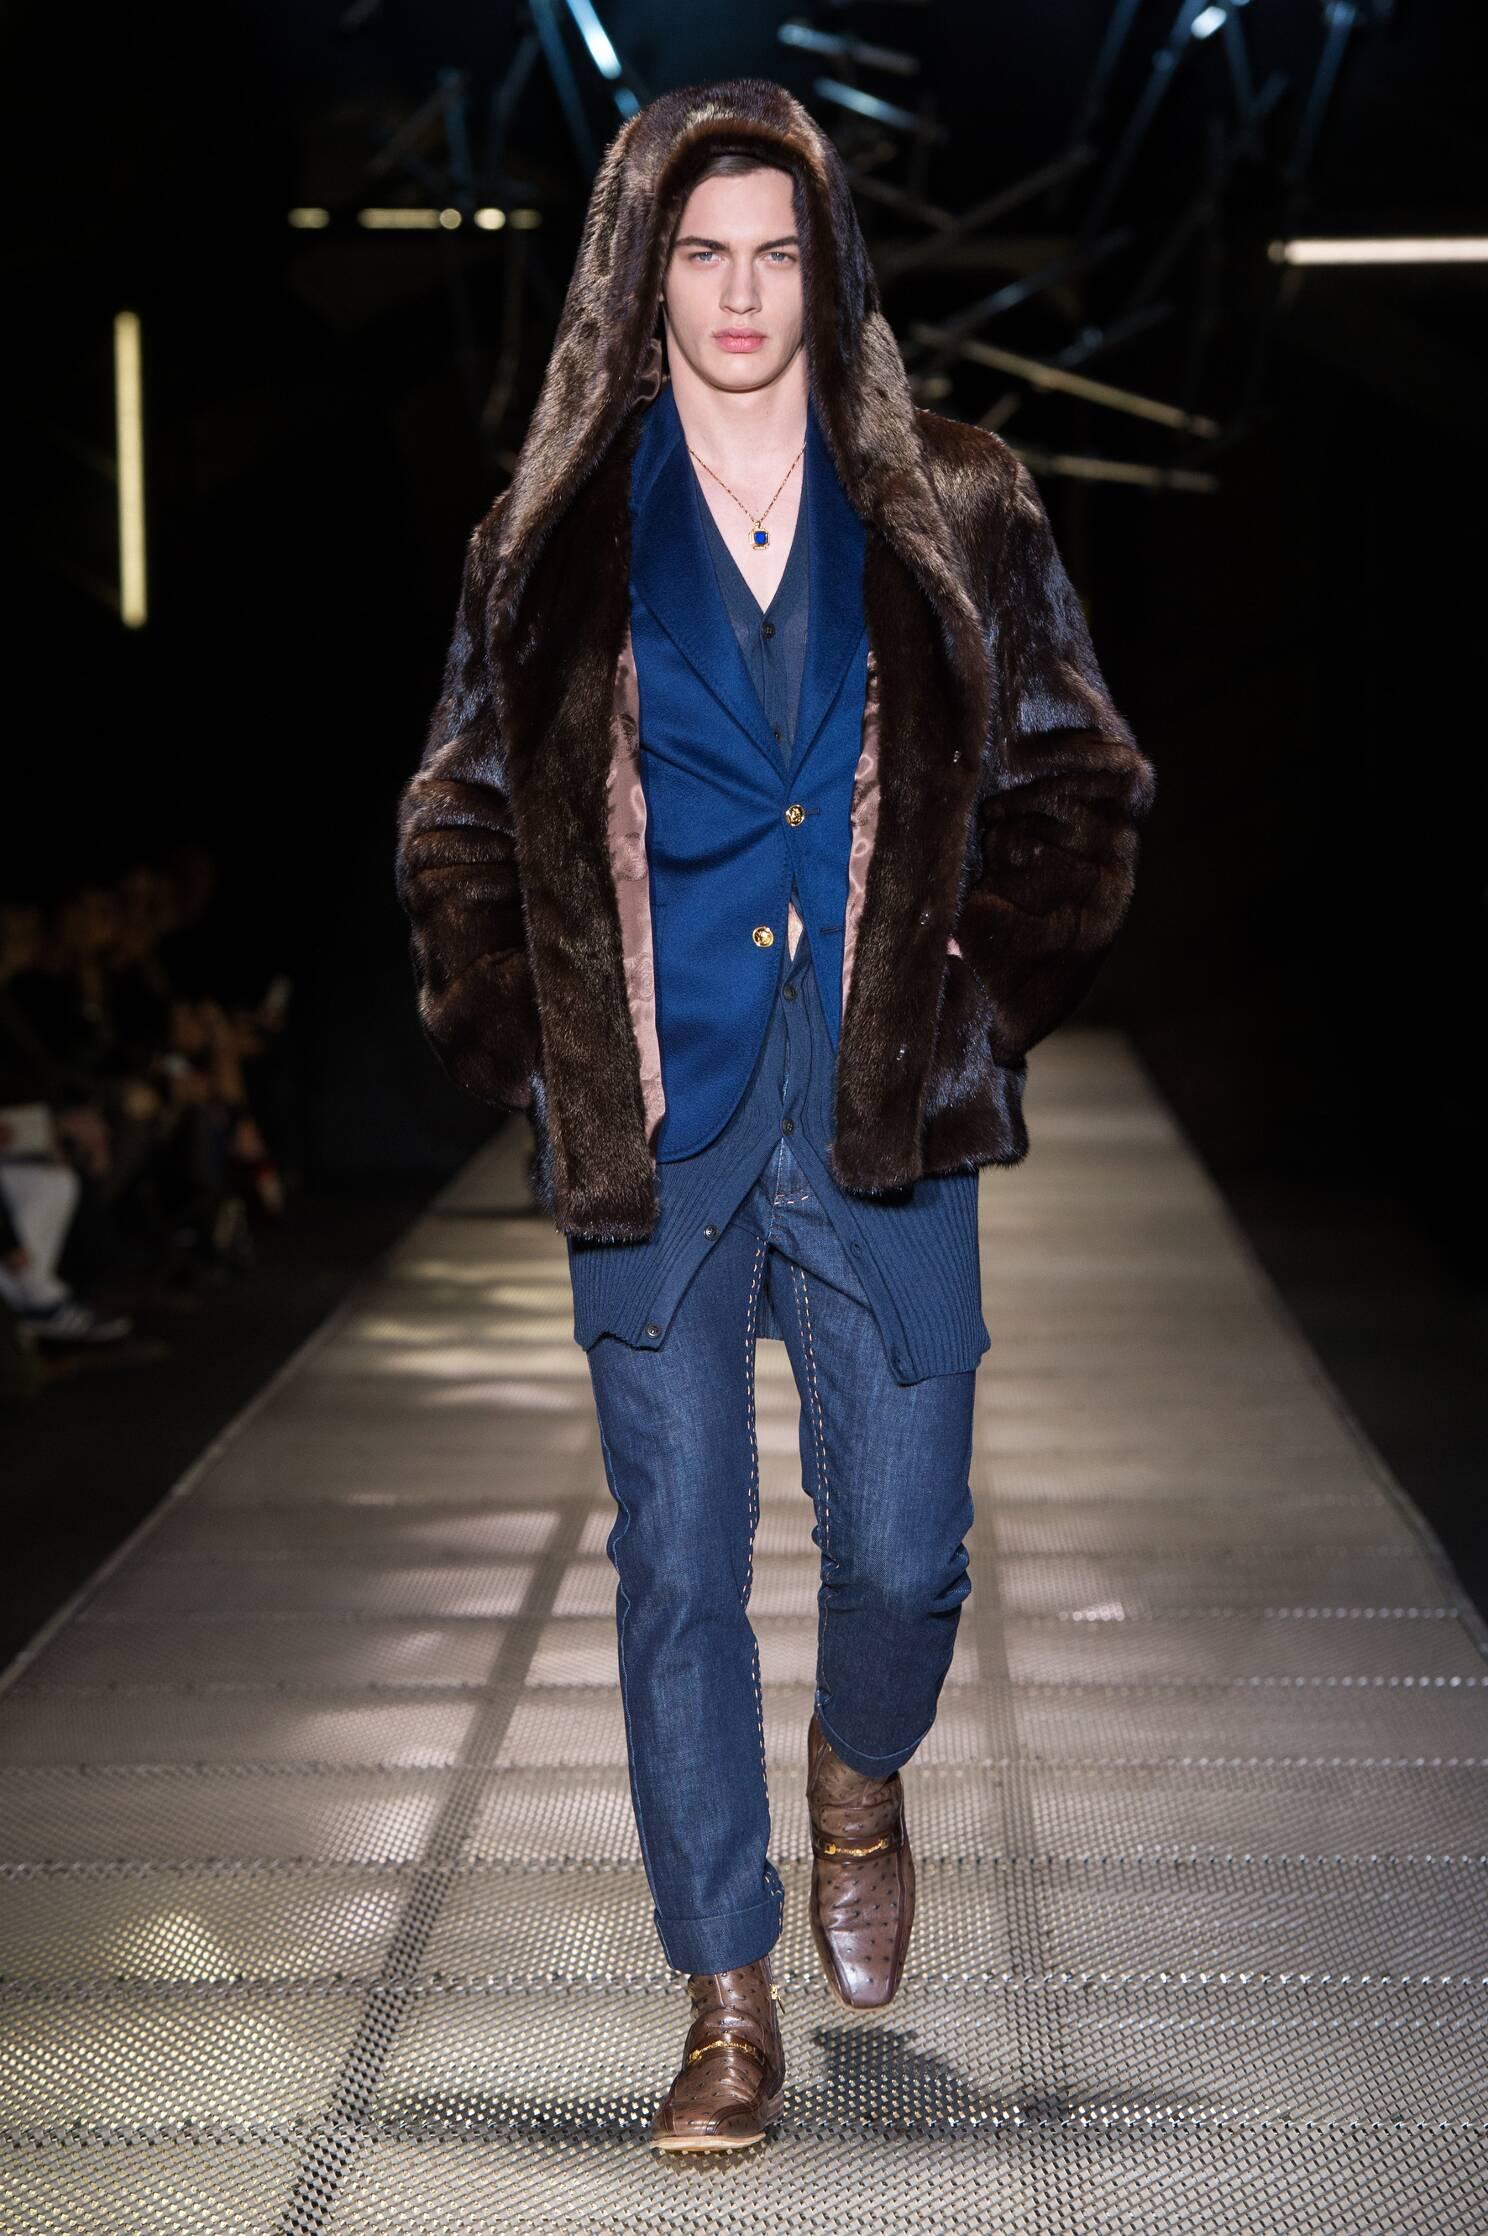 Catwalk Versace Fall Winter 2015 16 Men's Collection Milano Fashion Week